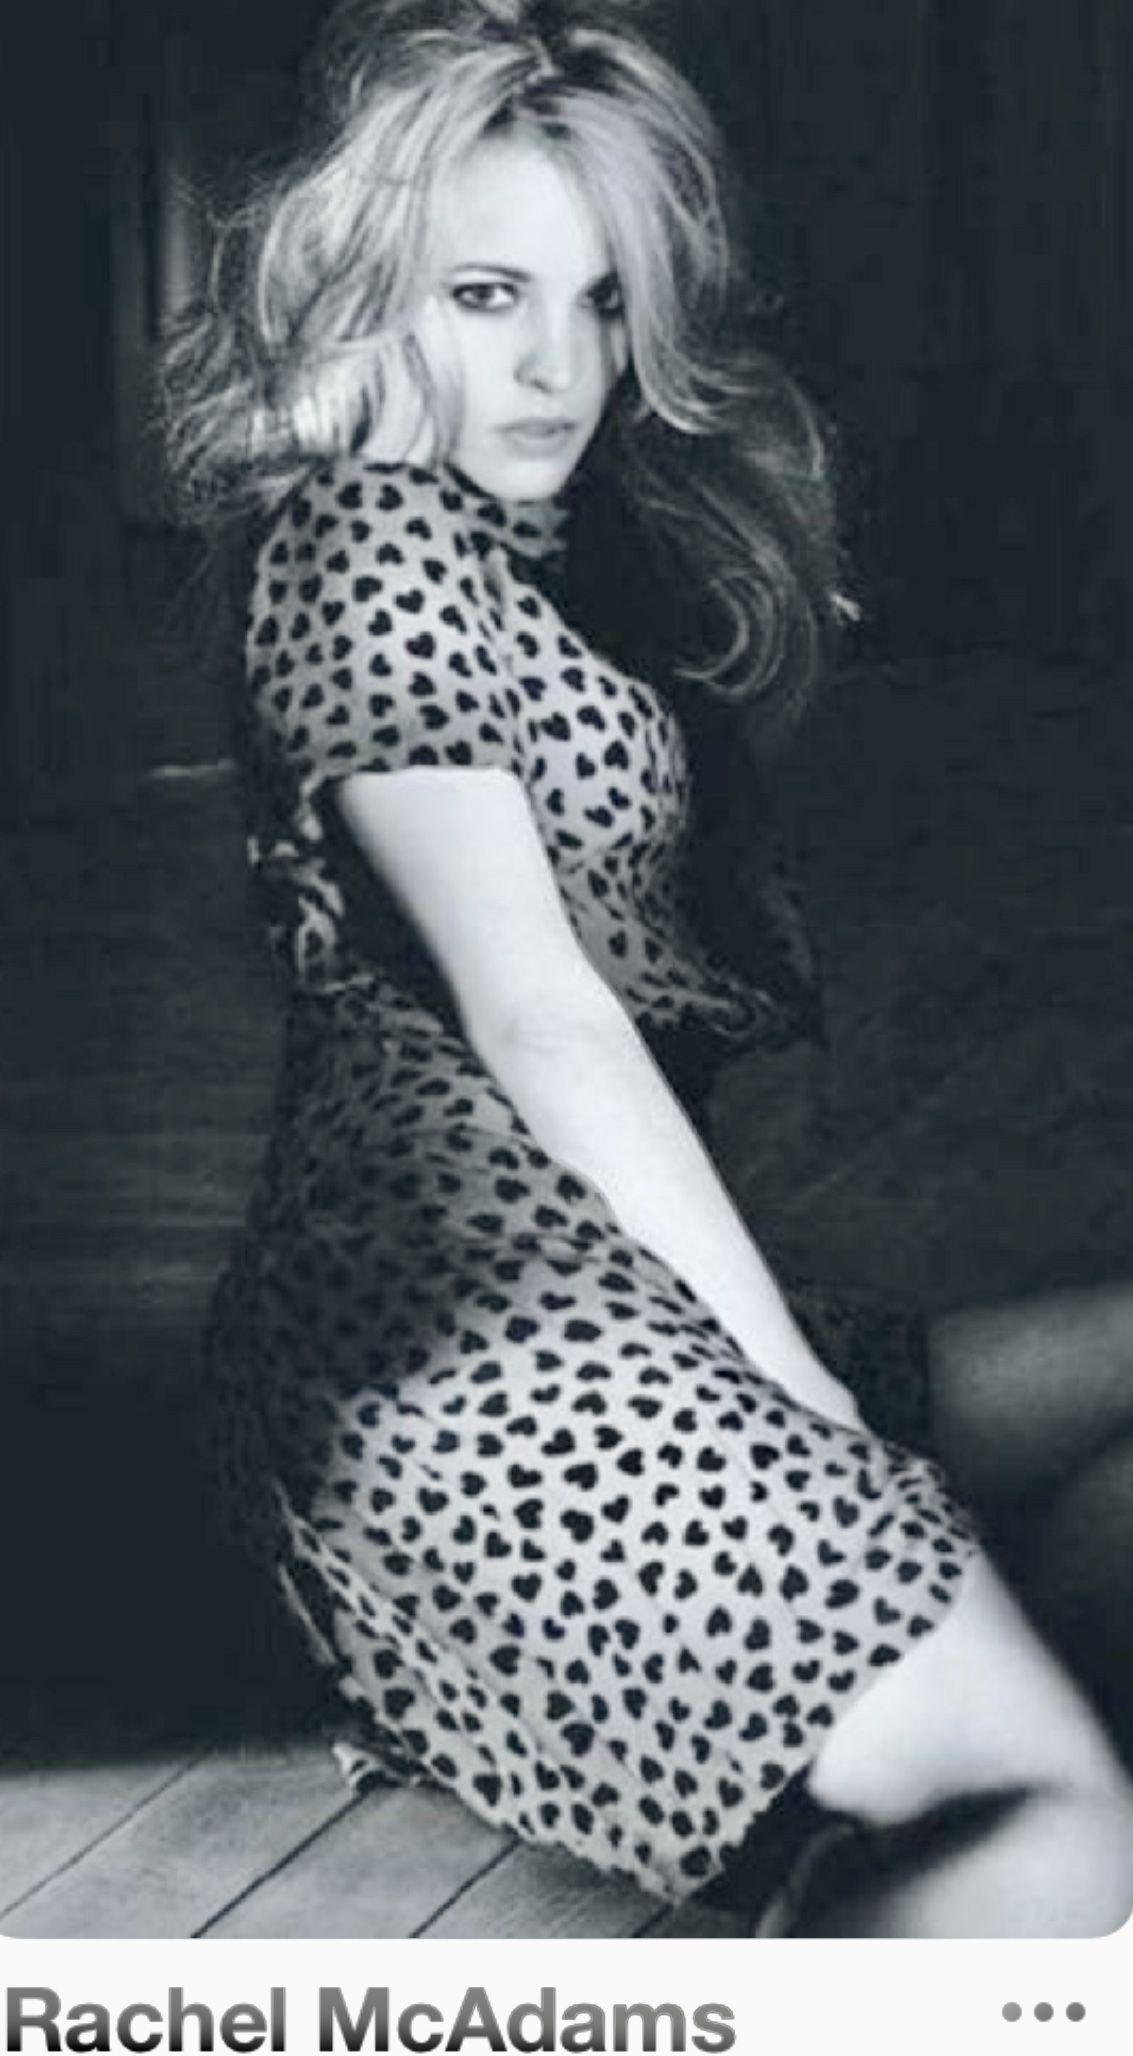 Rachael McAdams | Rachel mcadams, Rachel mcadams hot, Rachel anne ...